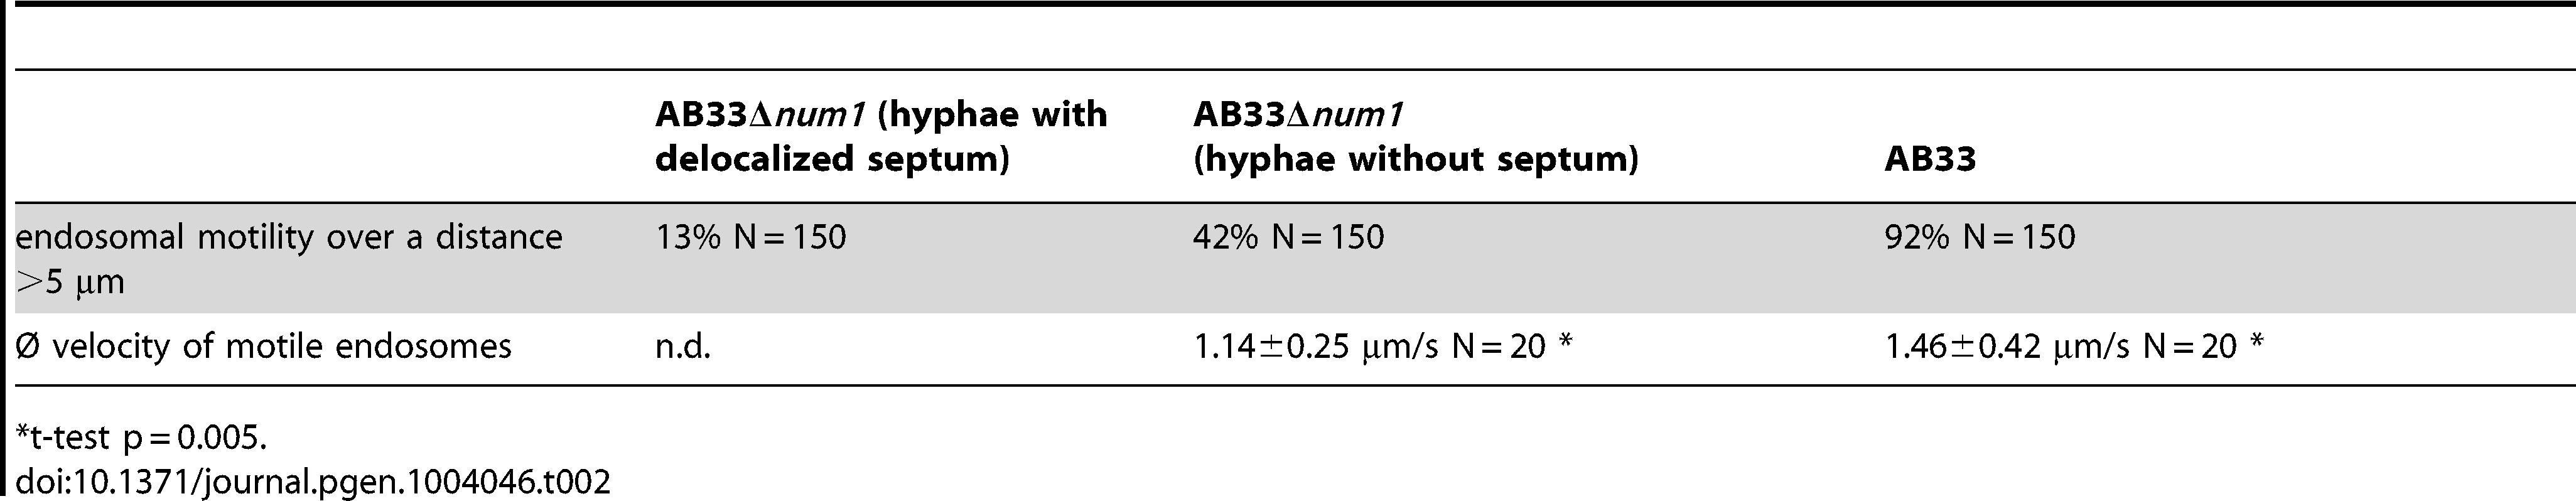 Reduced endosomal motility in <i>num1</i>-deletion strains.